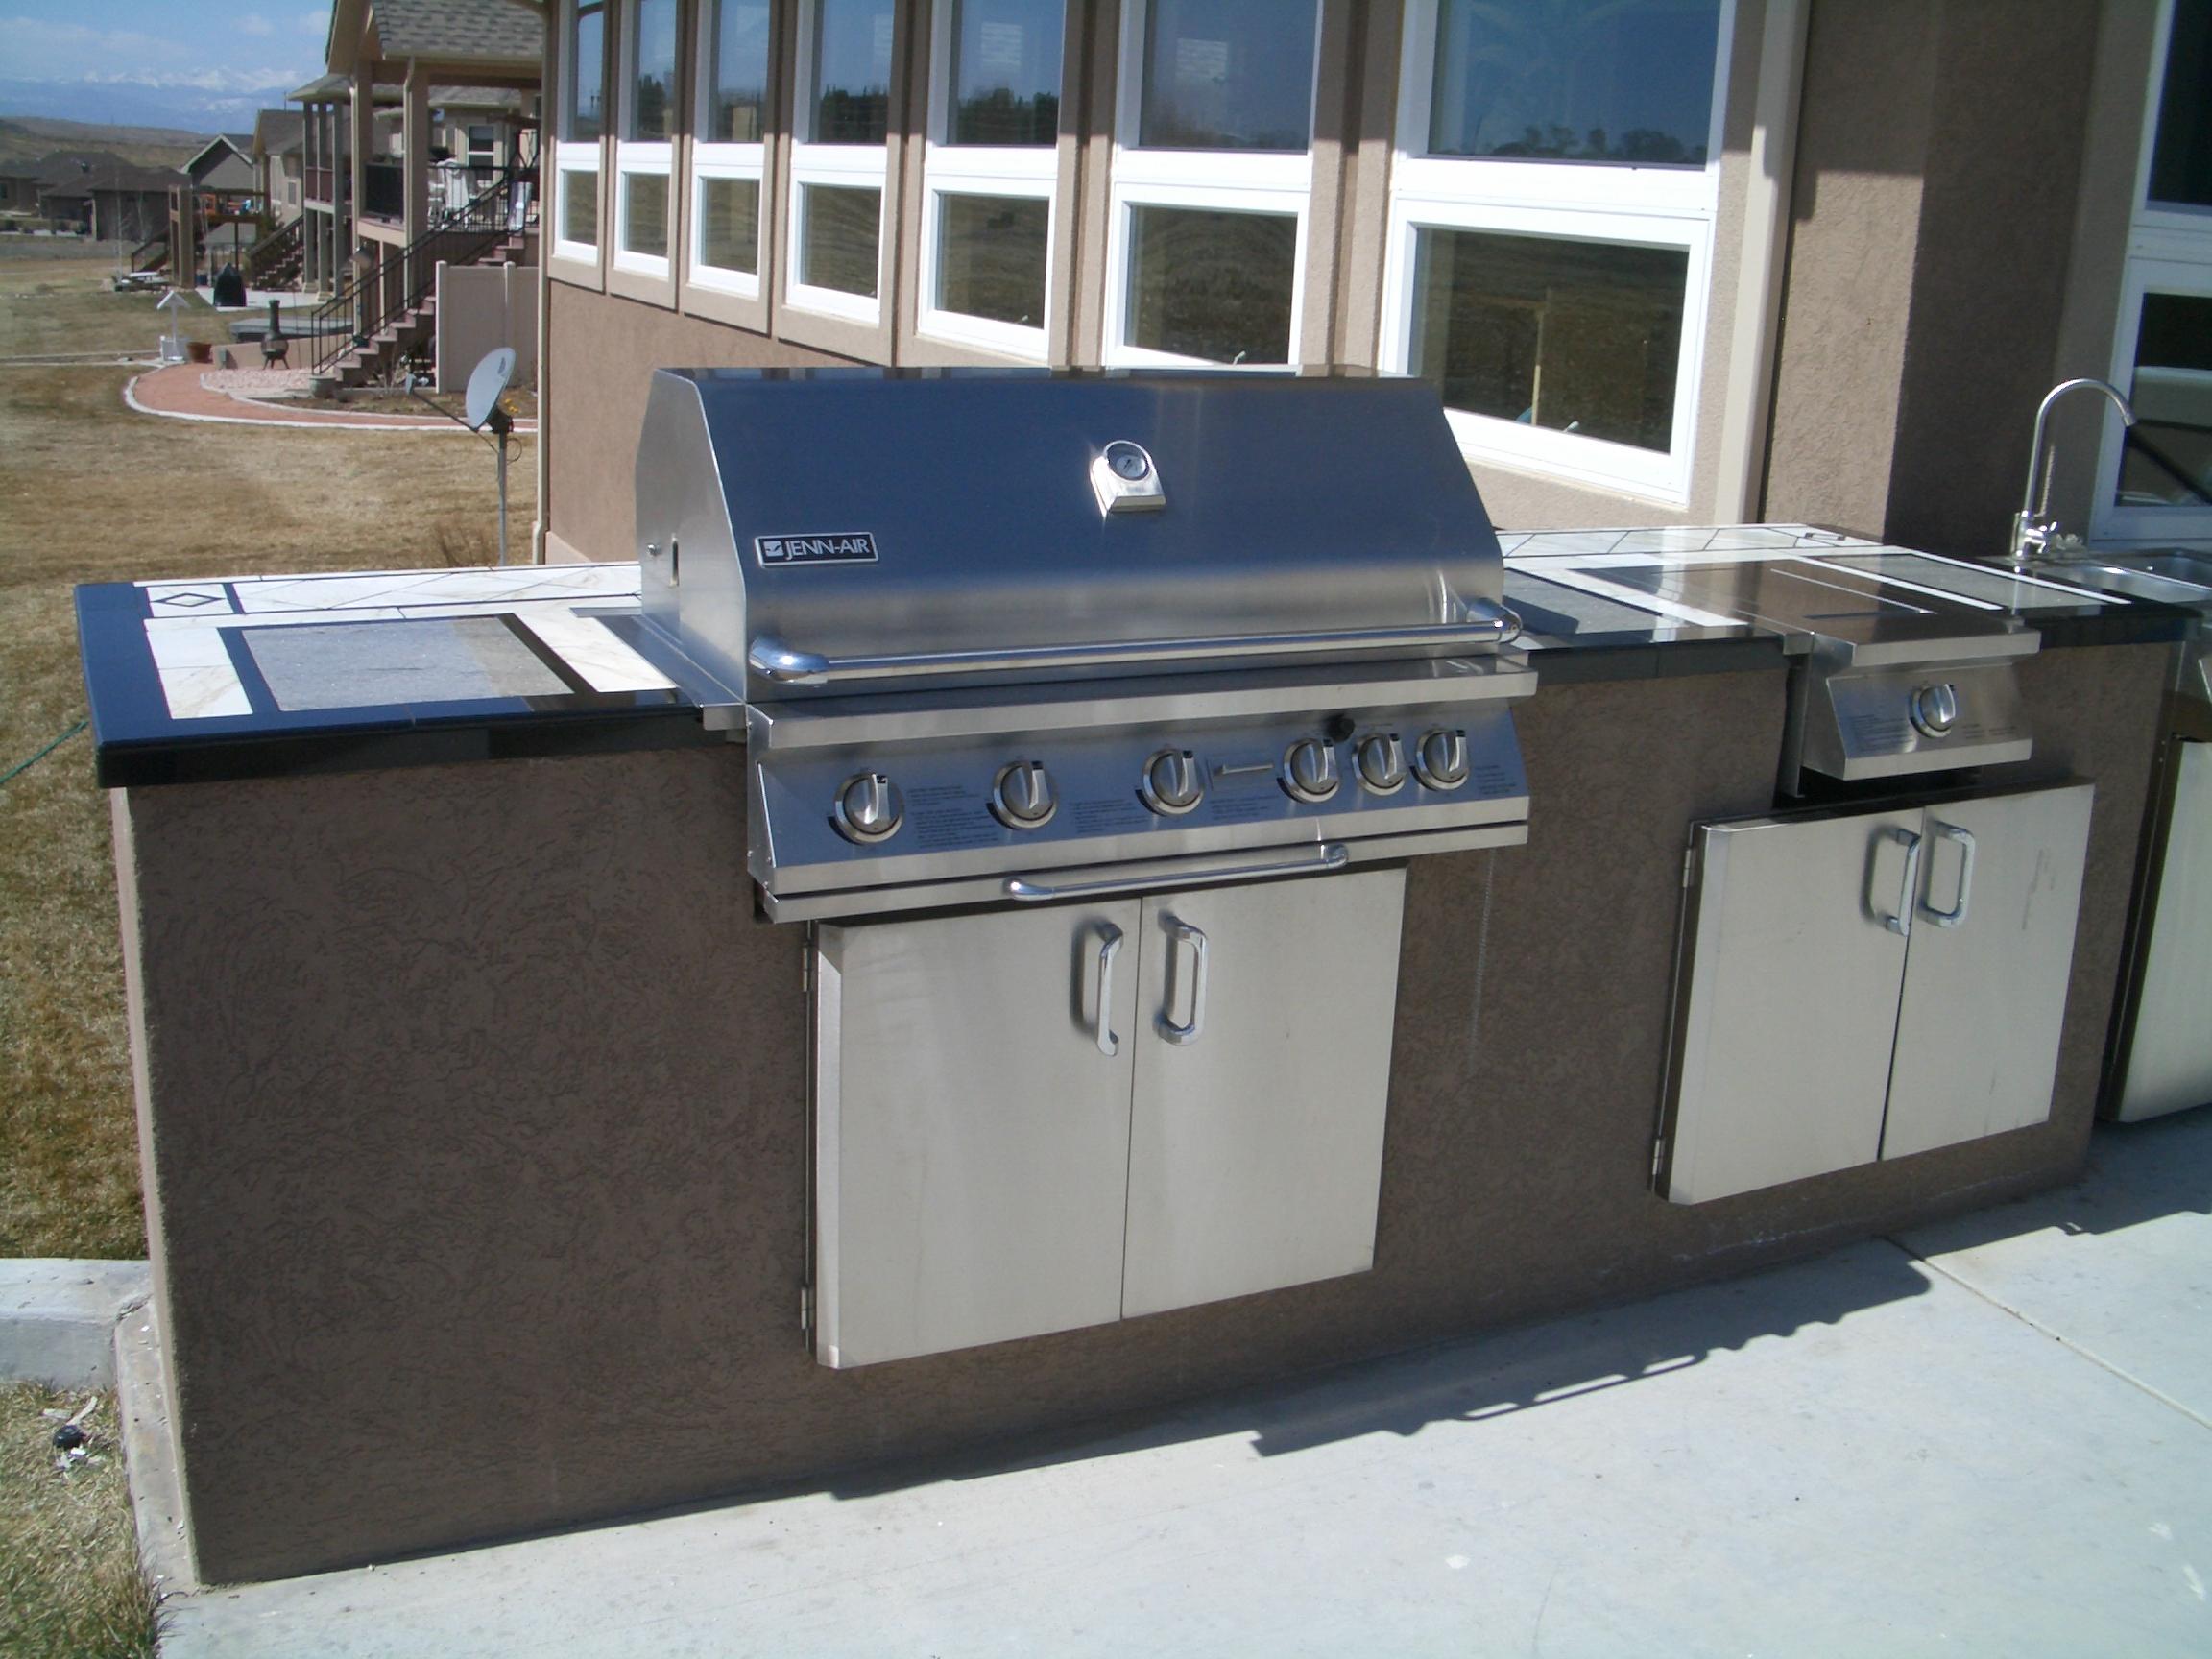 outdoor kitchens bbq islands outdoor kitchen island Outdoor Kitchens and BBQ Islands in Fort Collins Loveland Greeley Northern Colorado